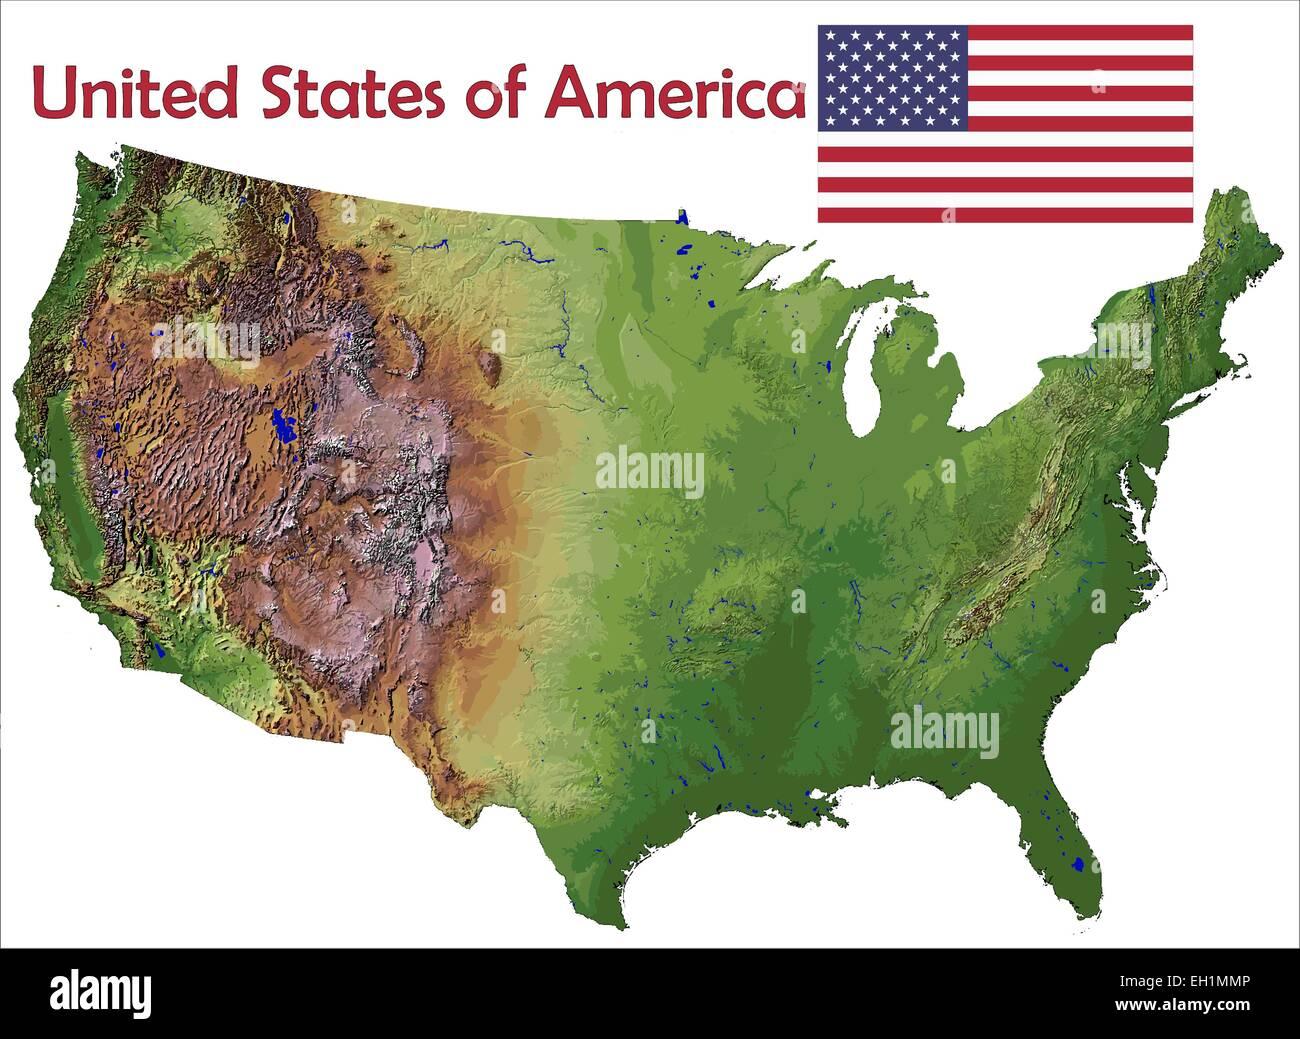 United States map flag Stock Vector Art & Illustration, Vector Image ...